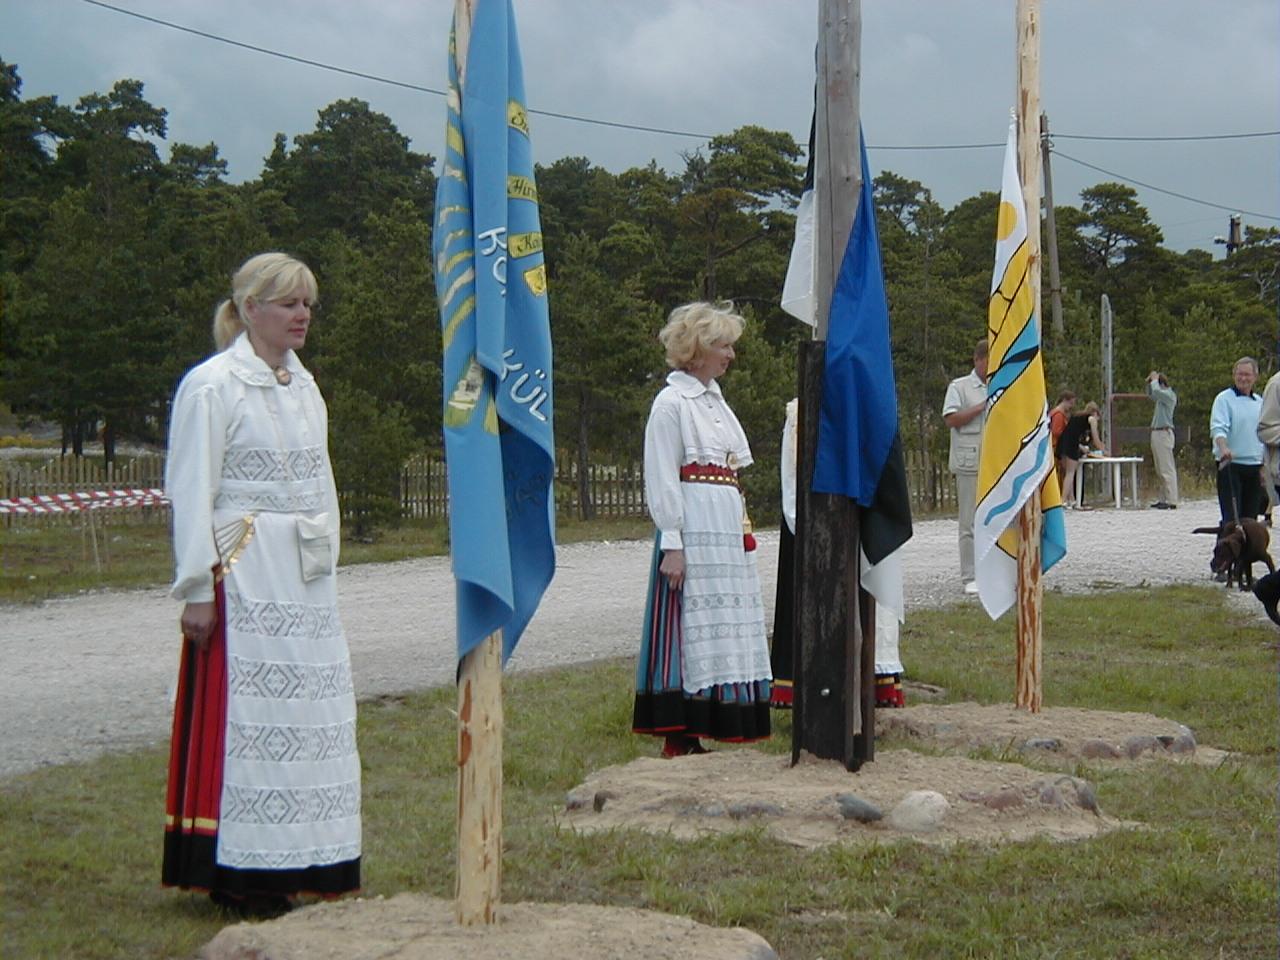 Lippude heiskamine Kalanas.JPG